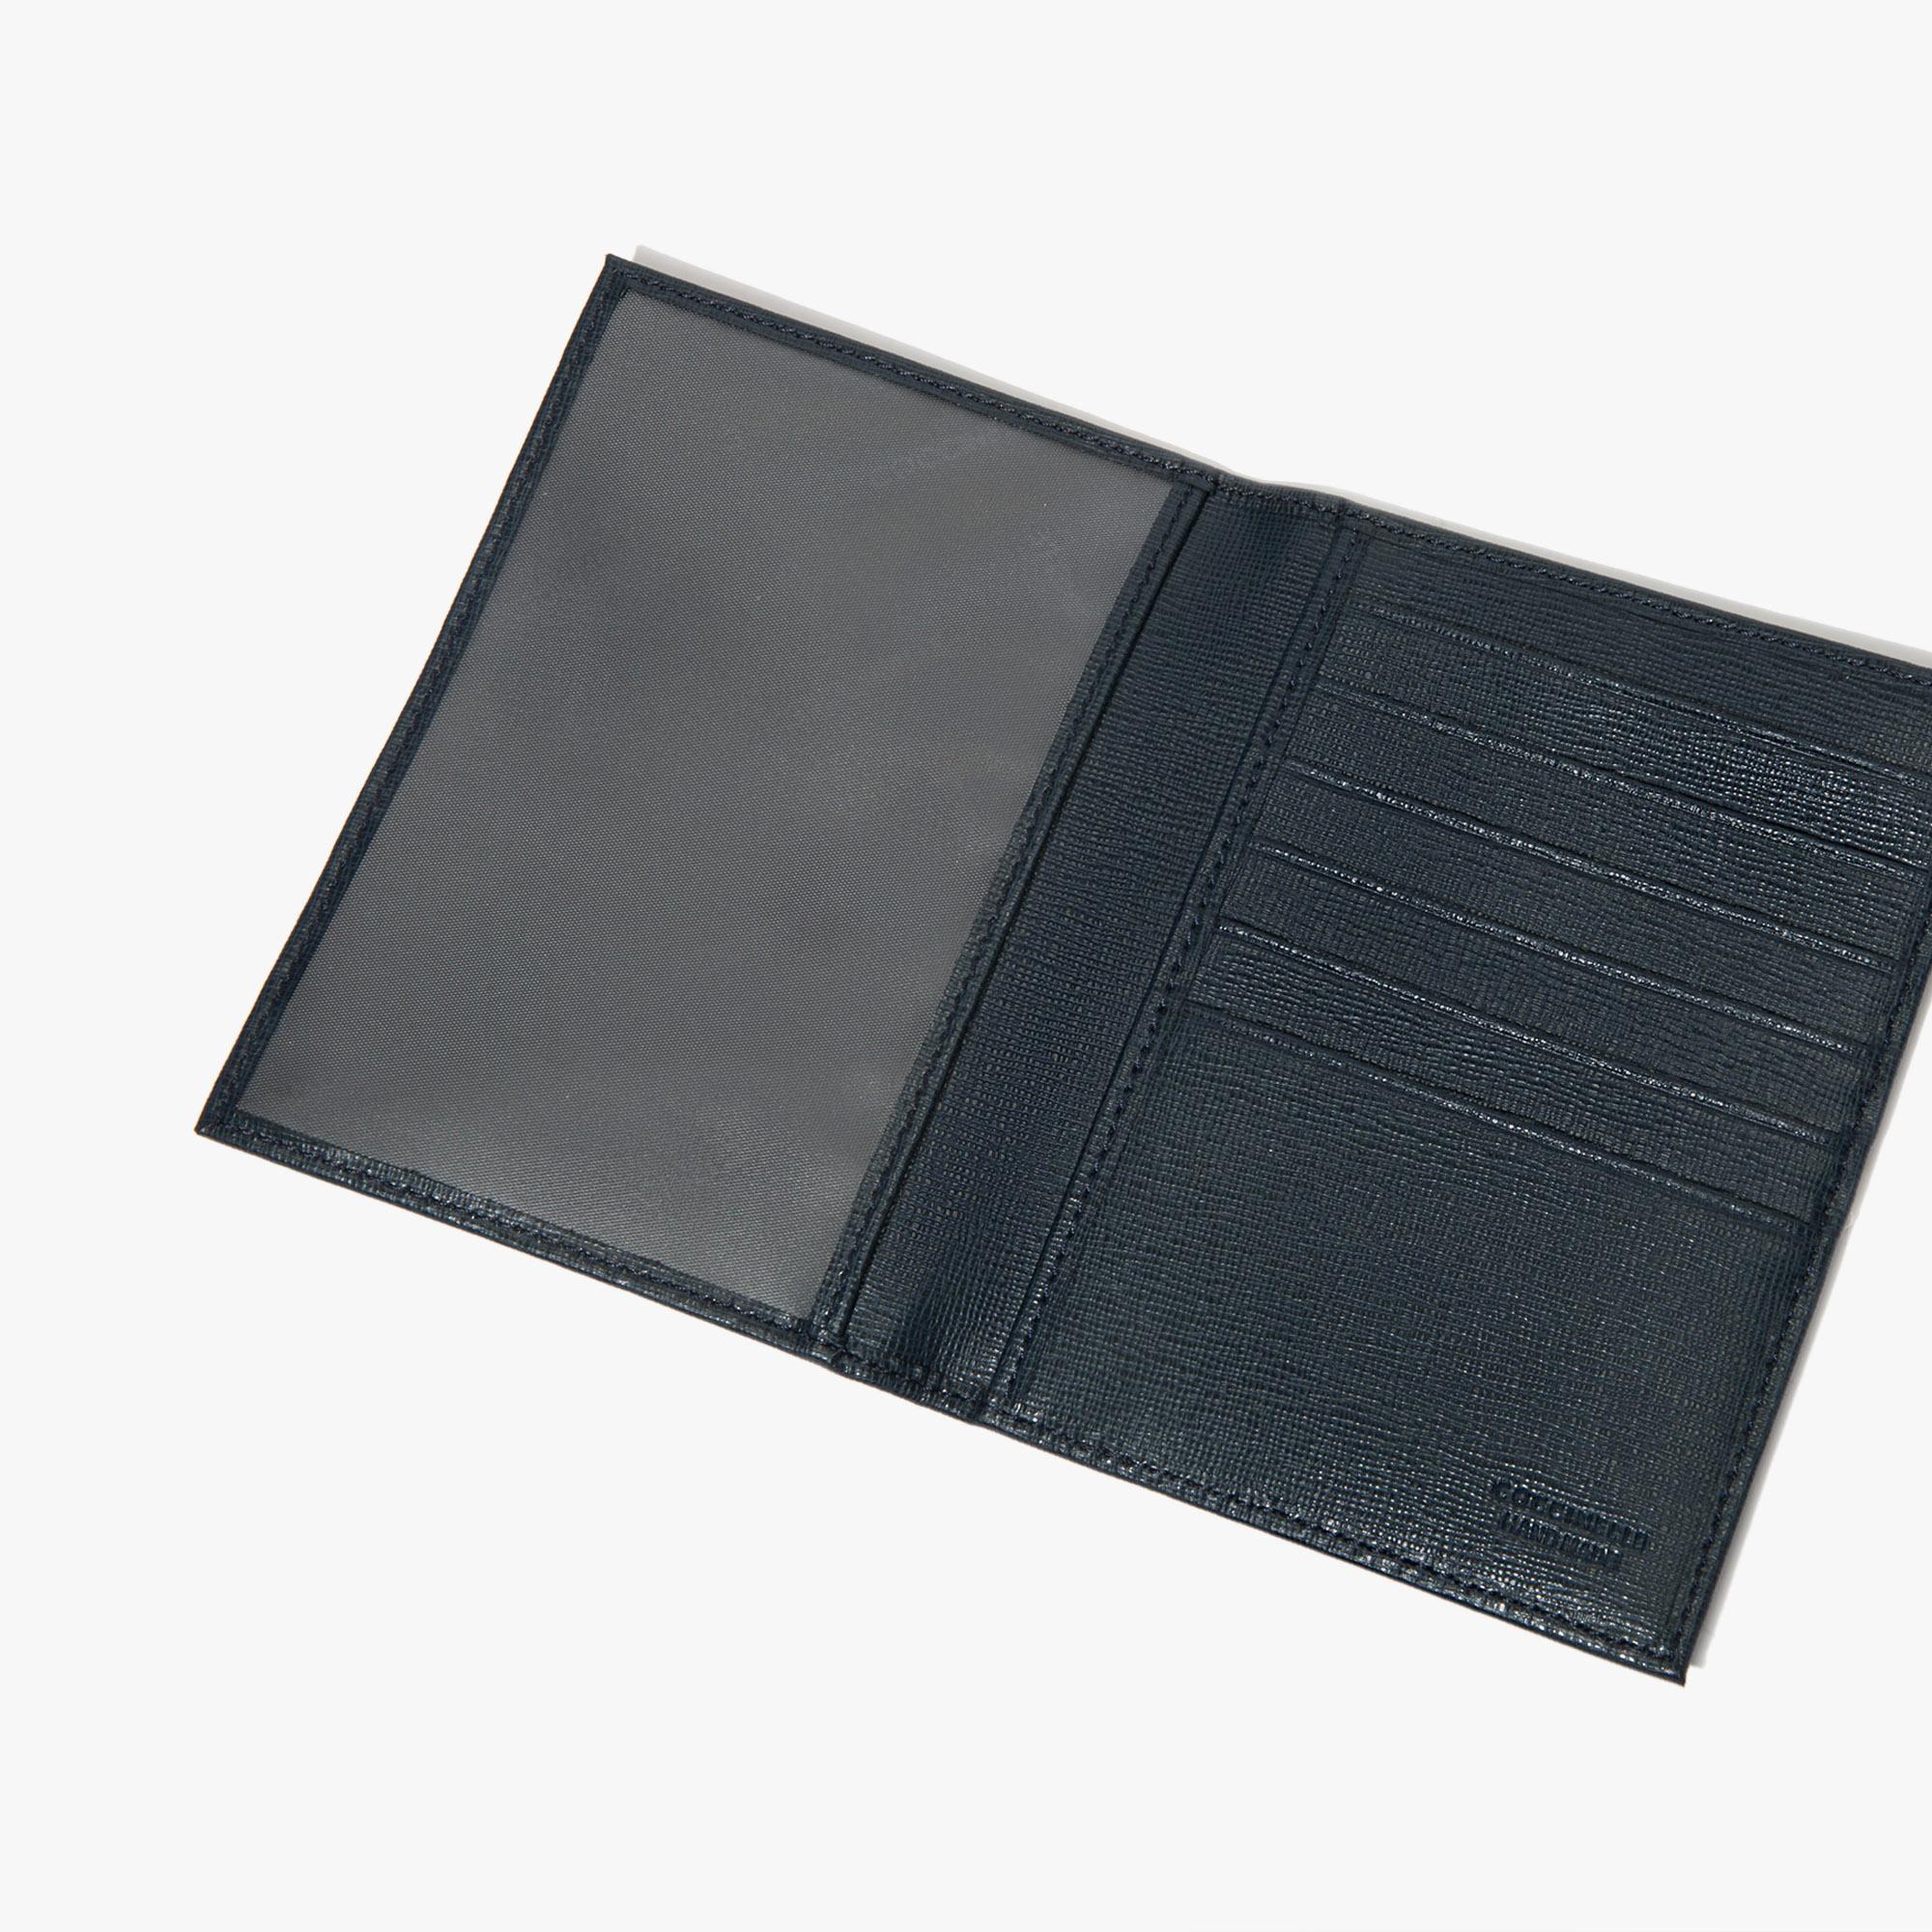 Saffiano document holder